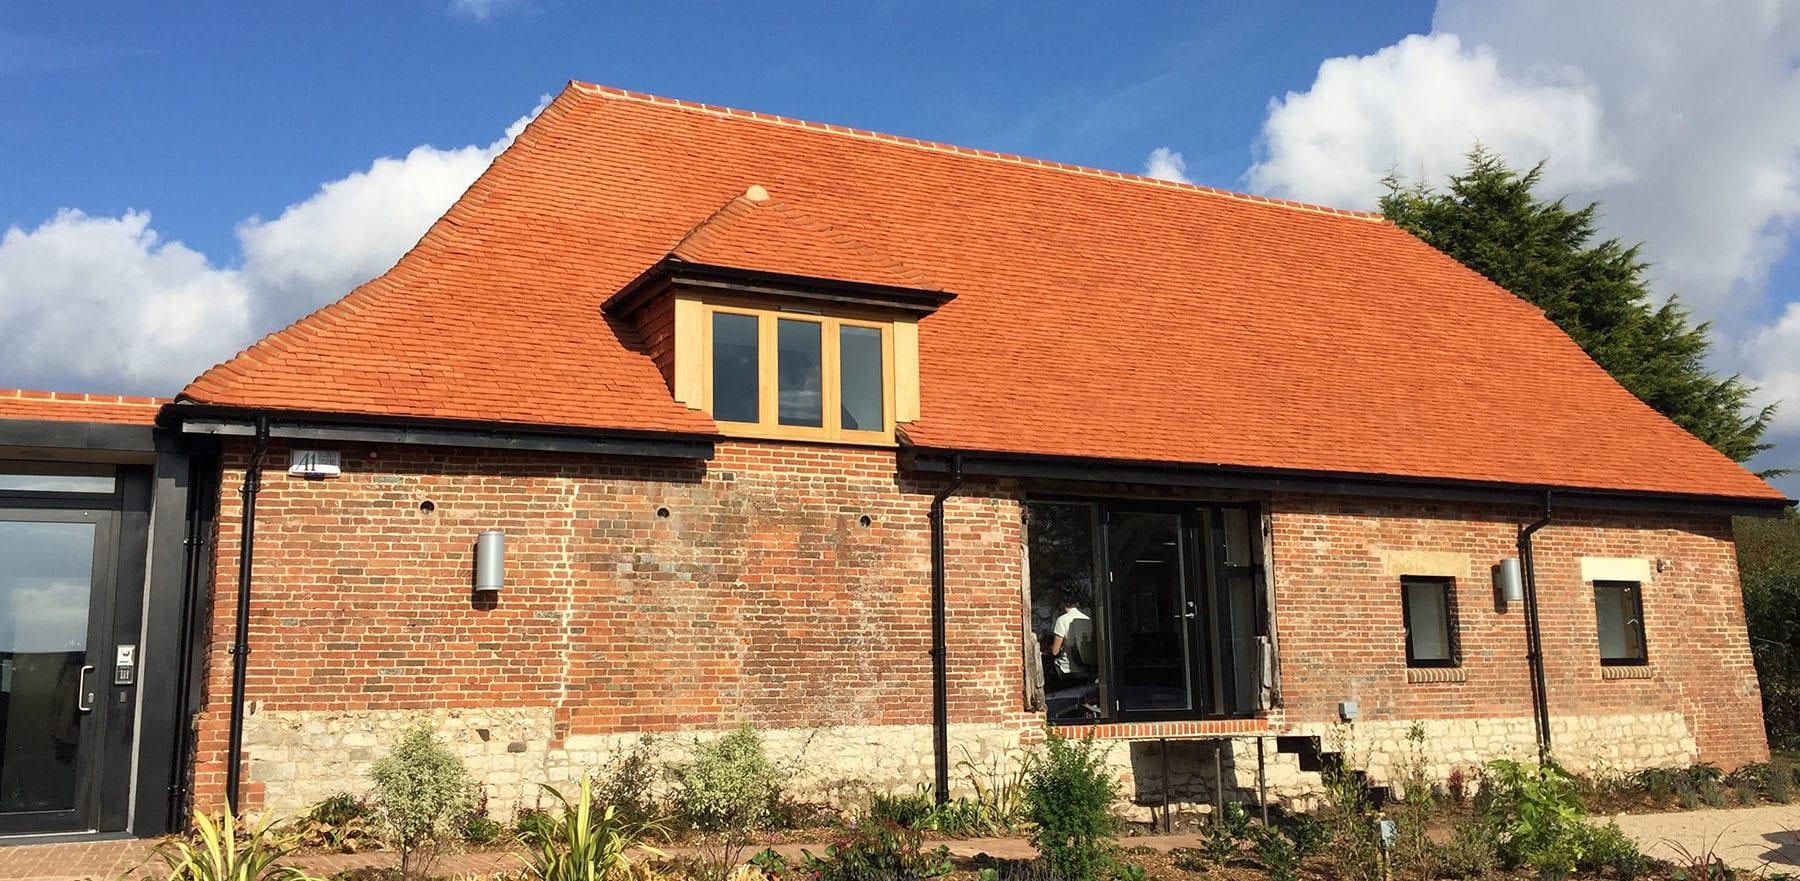 Lifestiles - Handcrafted Pentlow Clay Roof Tiles - Petersfield, England 4